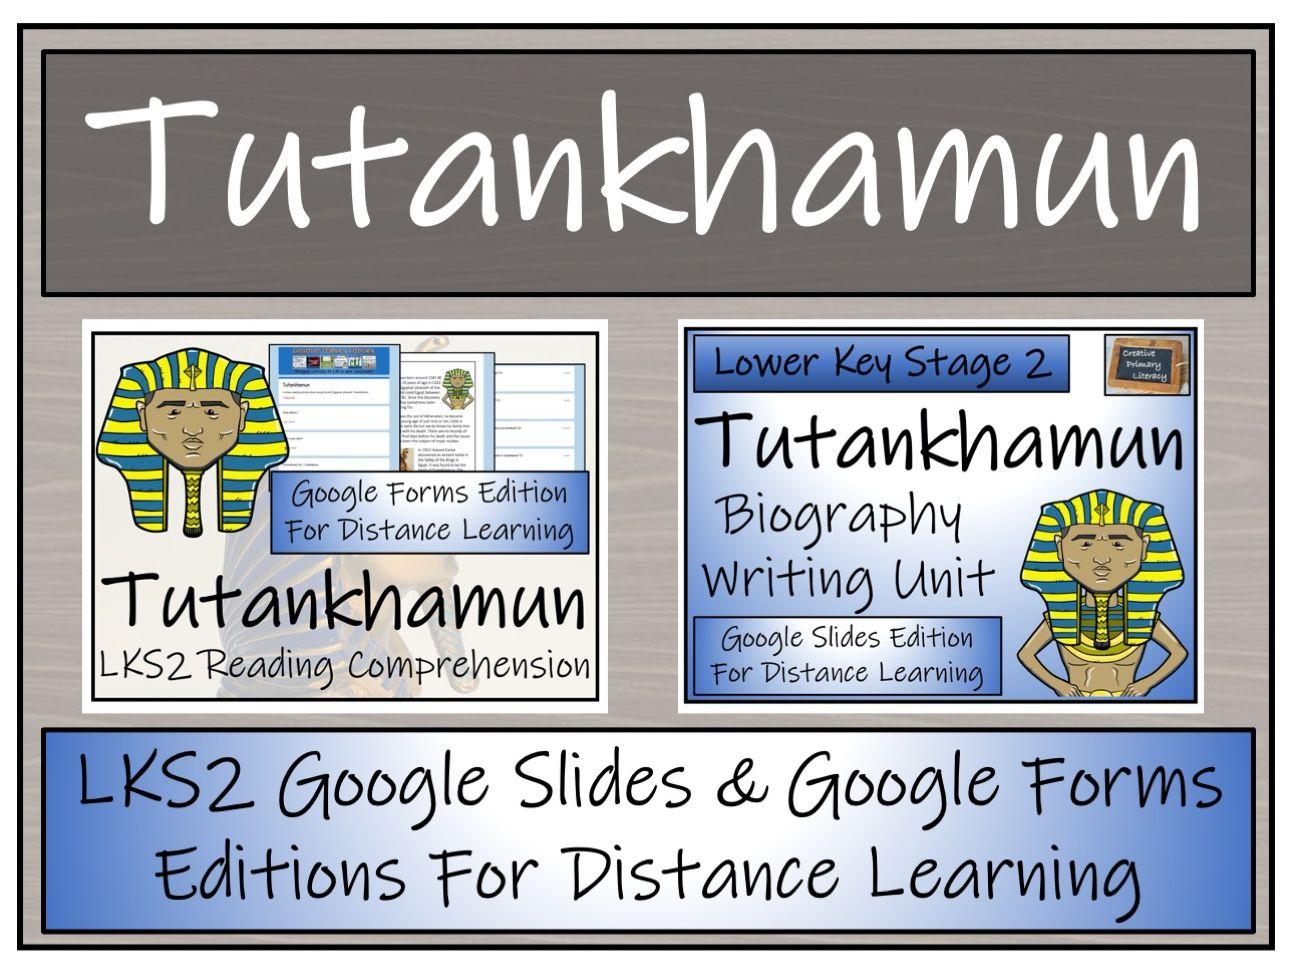 LKS2 Tutankhamun Biography & Reading Comprehension Distance Learning Bundle